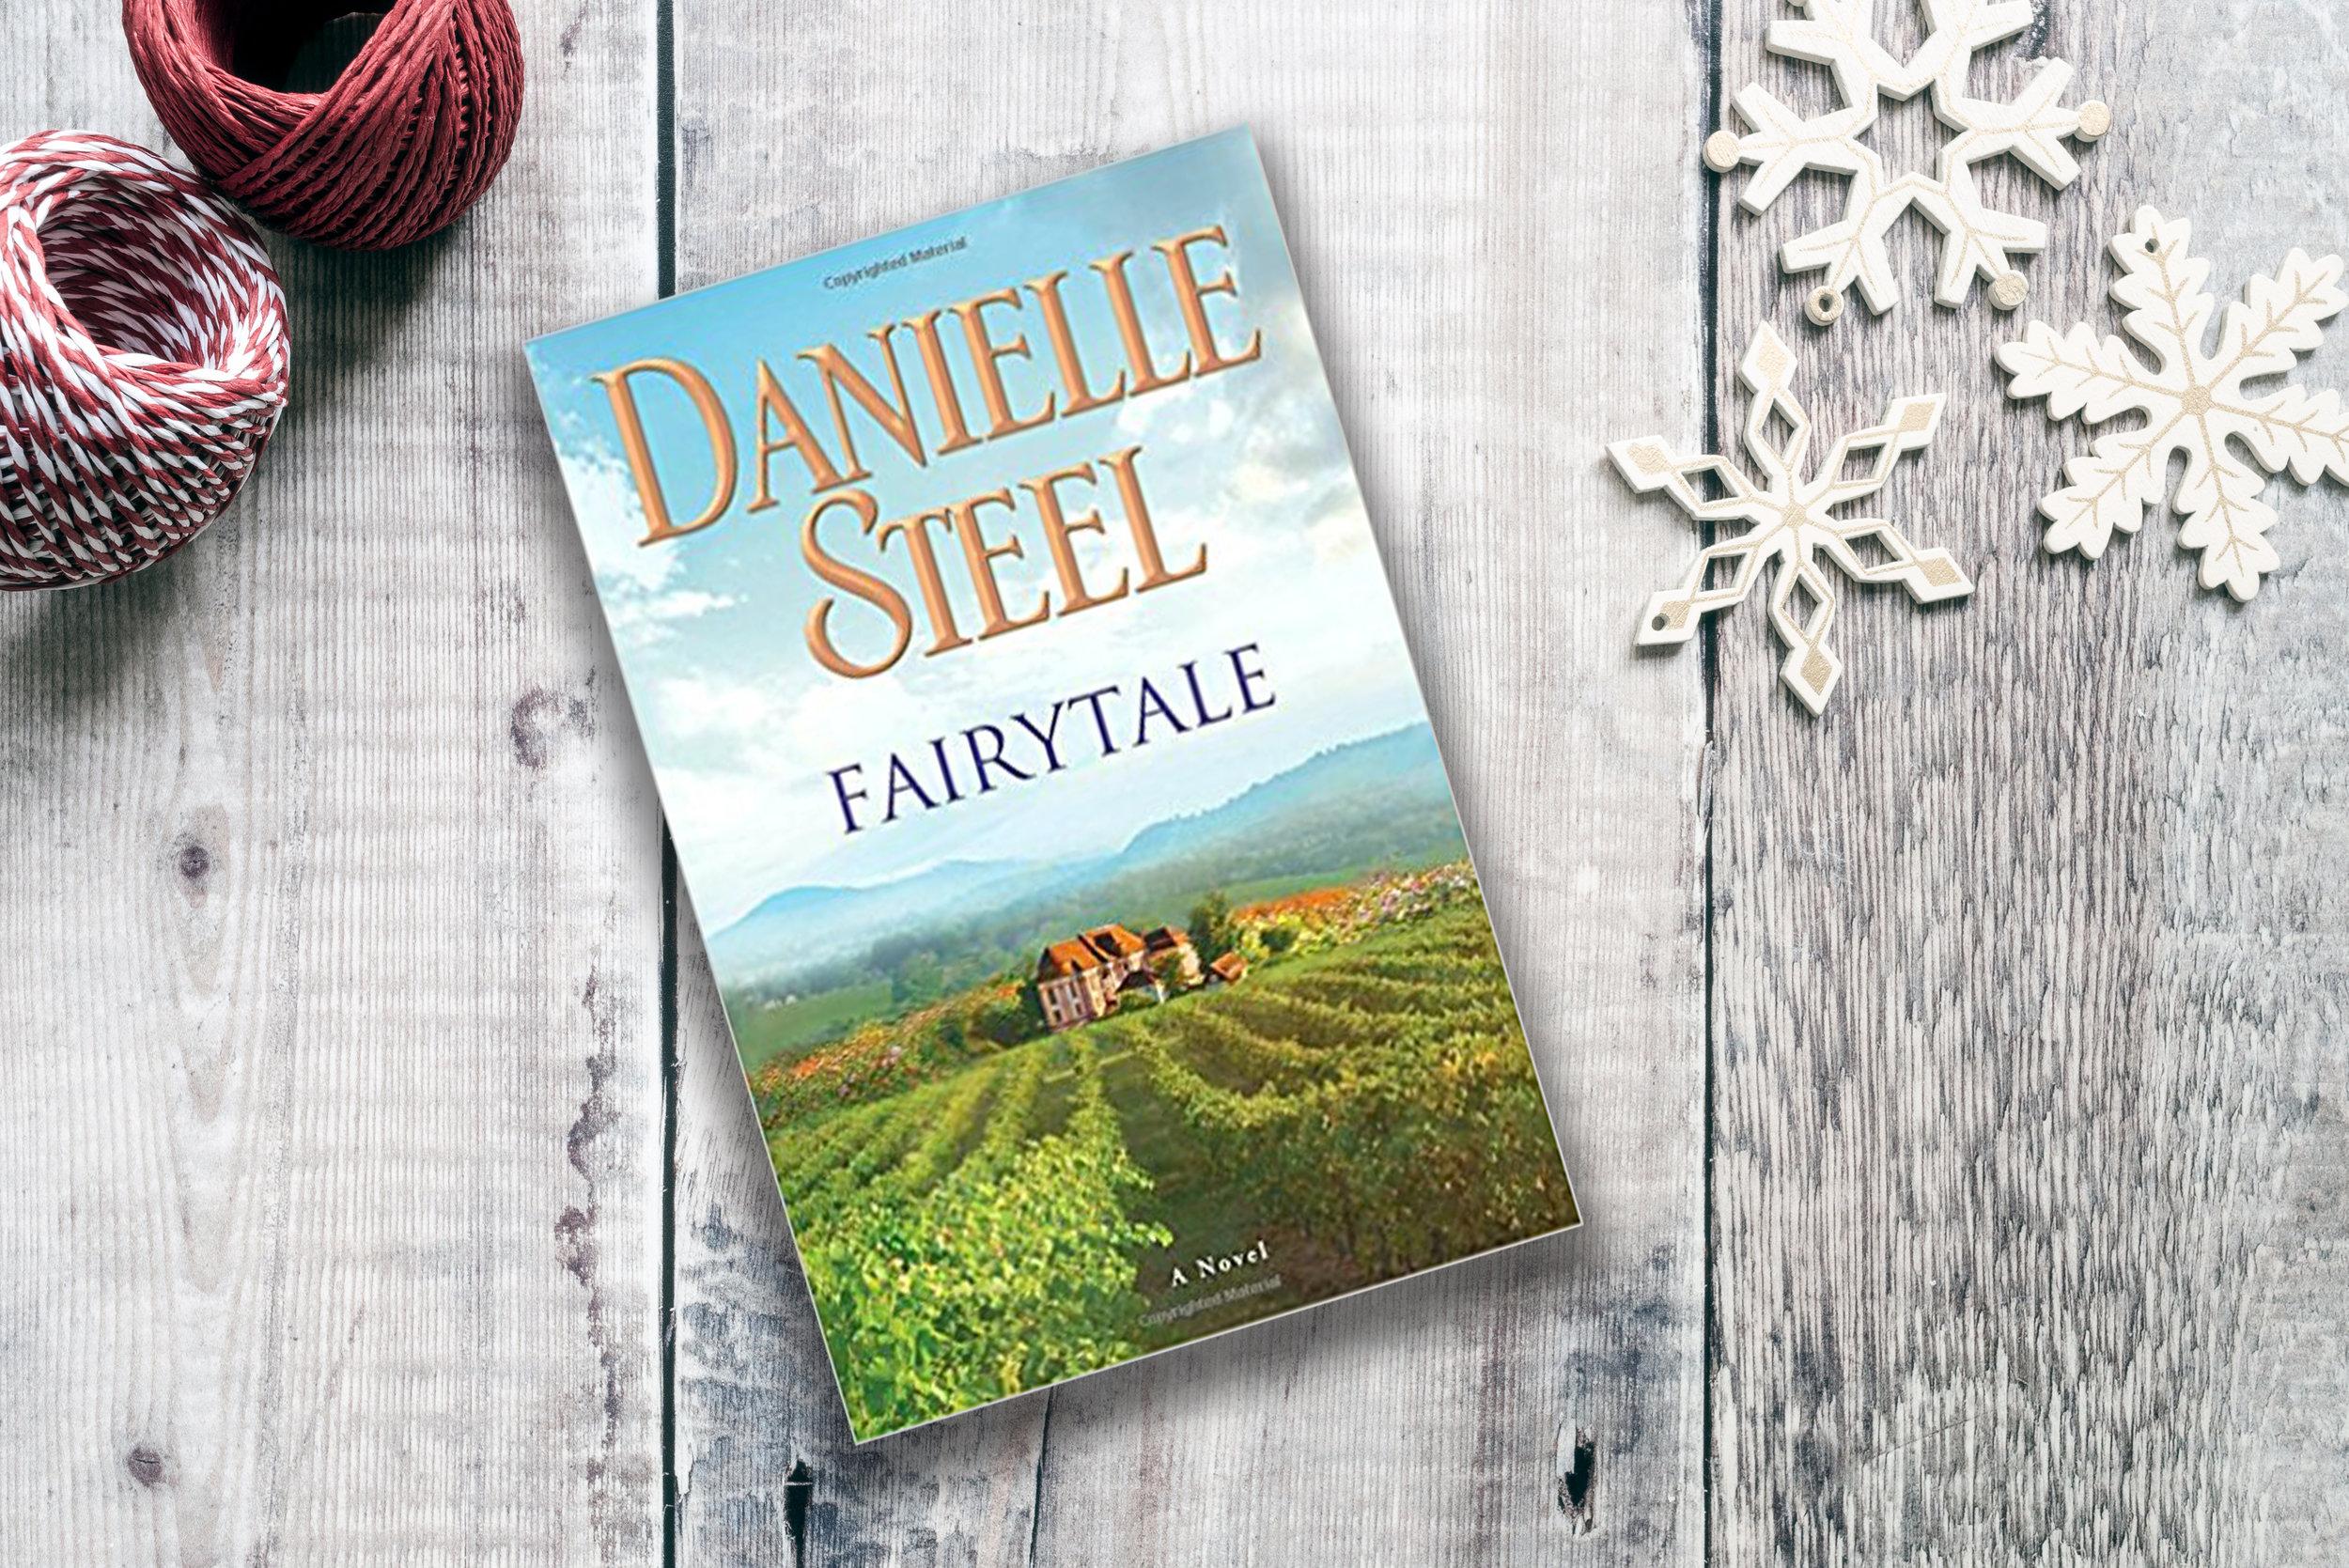 Fairytale Danielle Steel Book Review